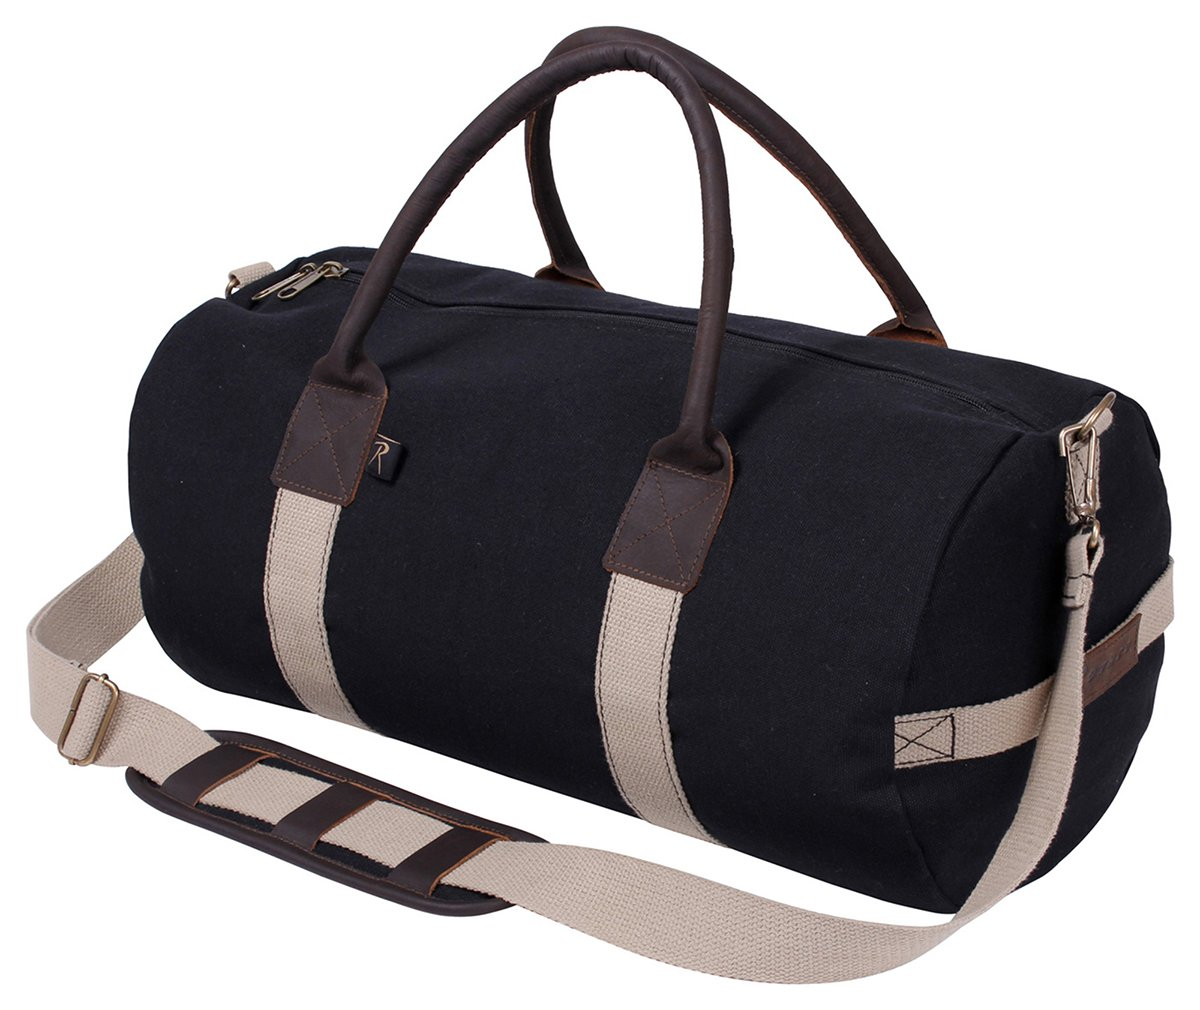 7f2cf317aa8 Amazon.com: Rothco 19'' Canvas & Leather Gym Bag, Black: Sports & Outdoors